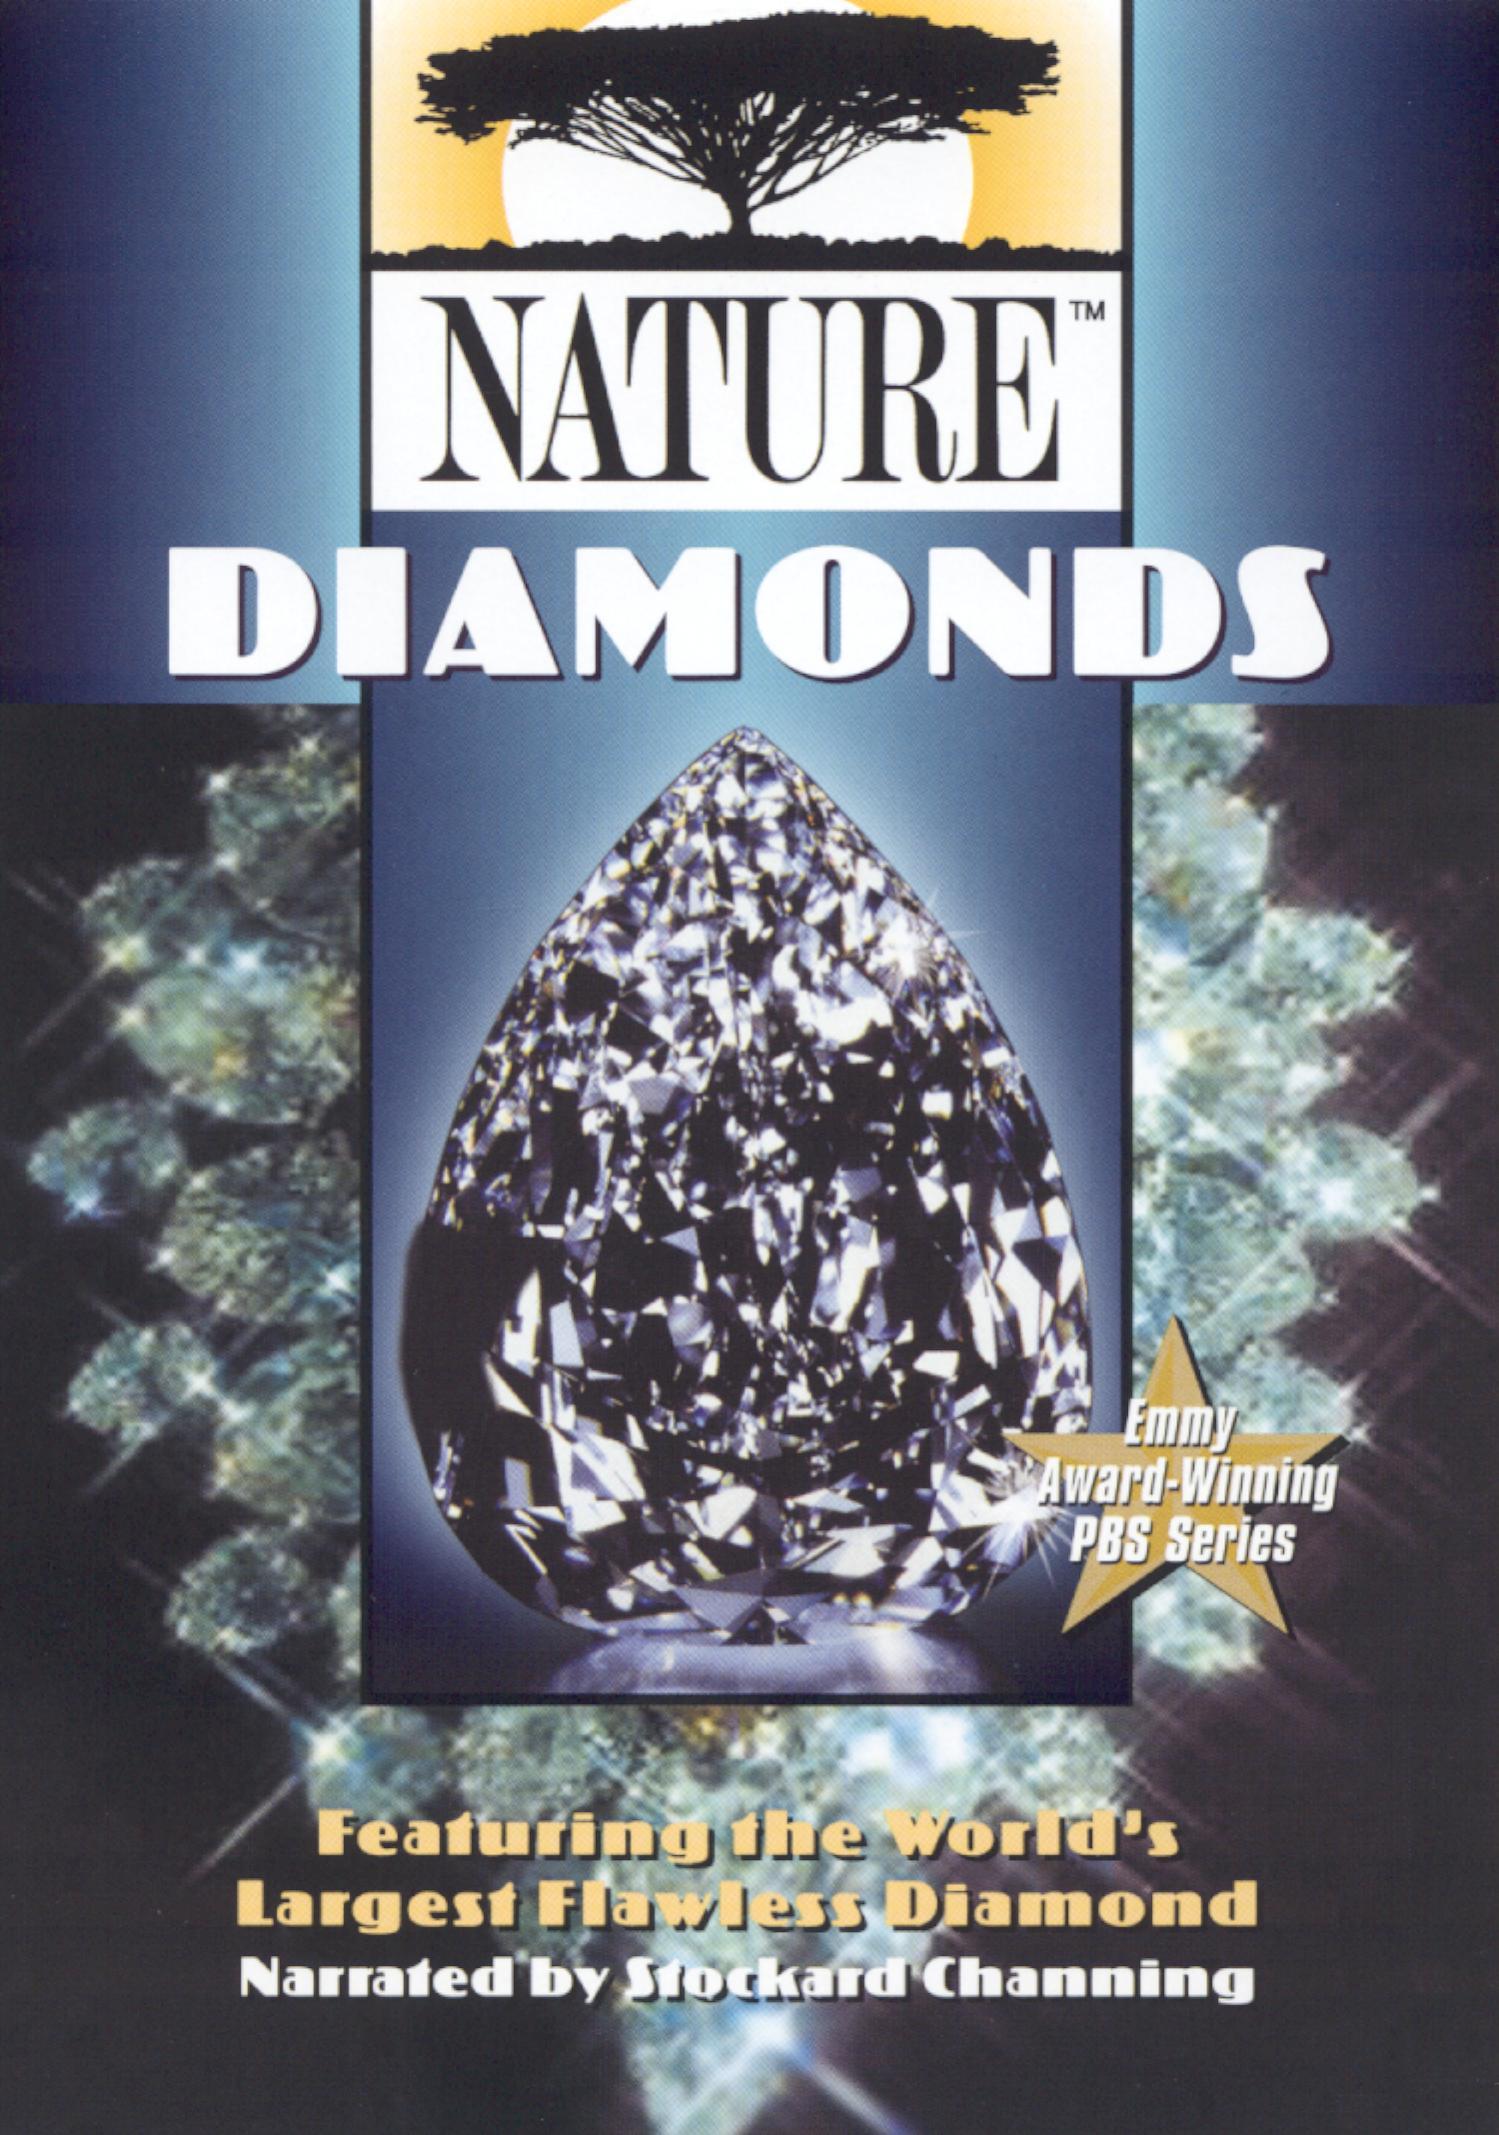 Nature: Diamonds (2004)